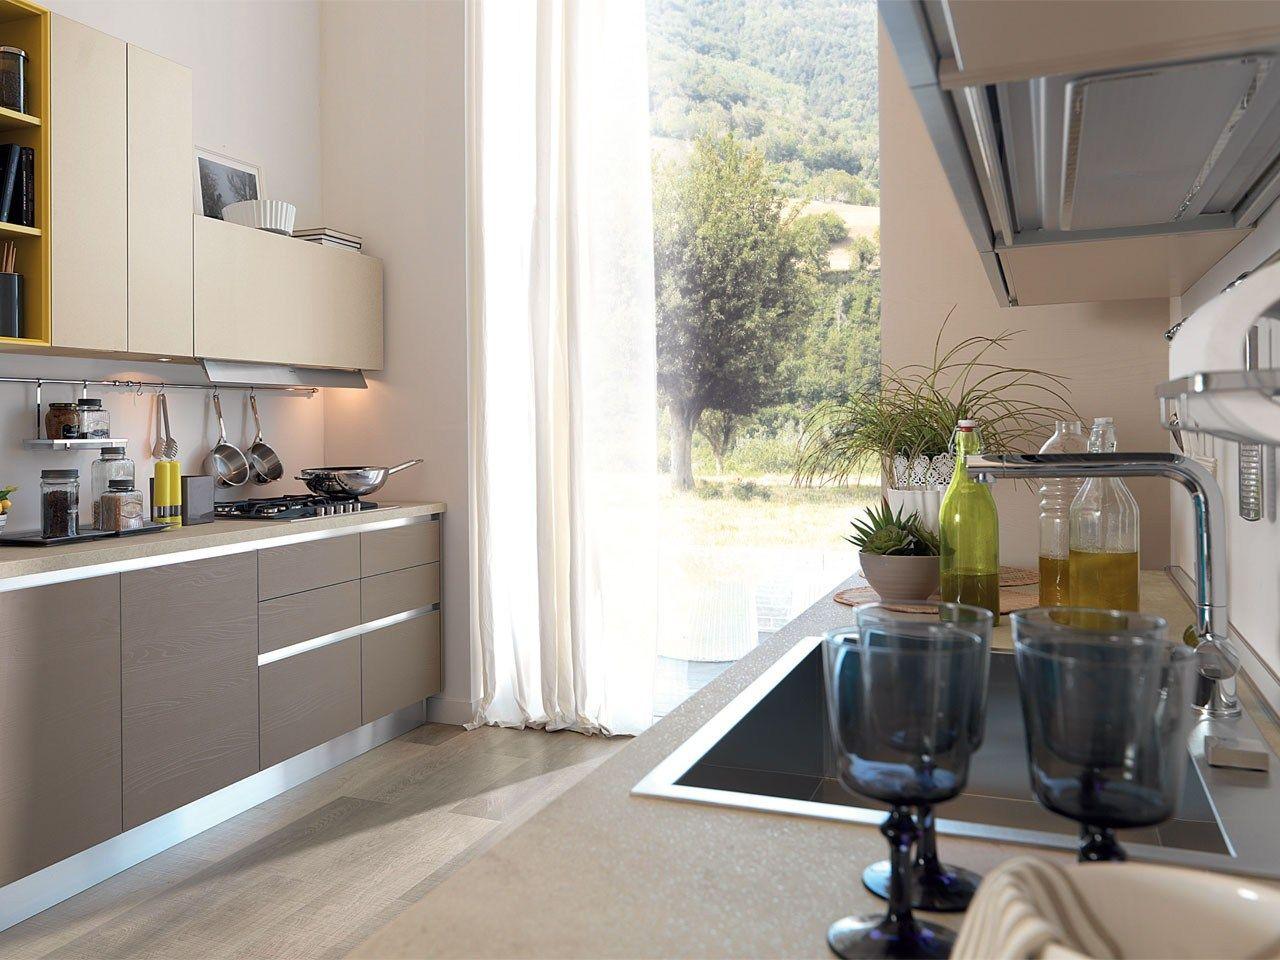 ESSENZA   Kitchen without handles By Cucine Lube